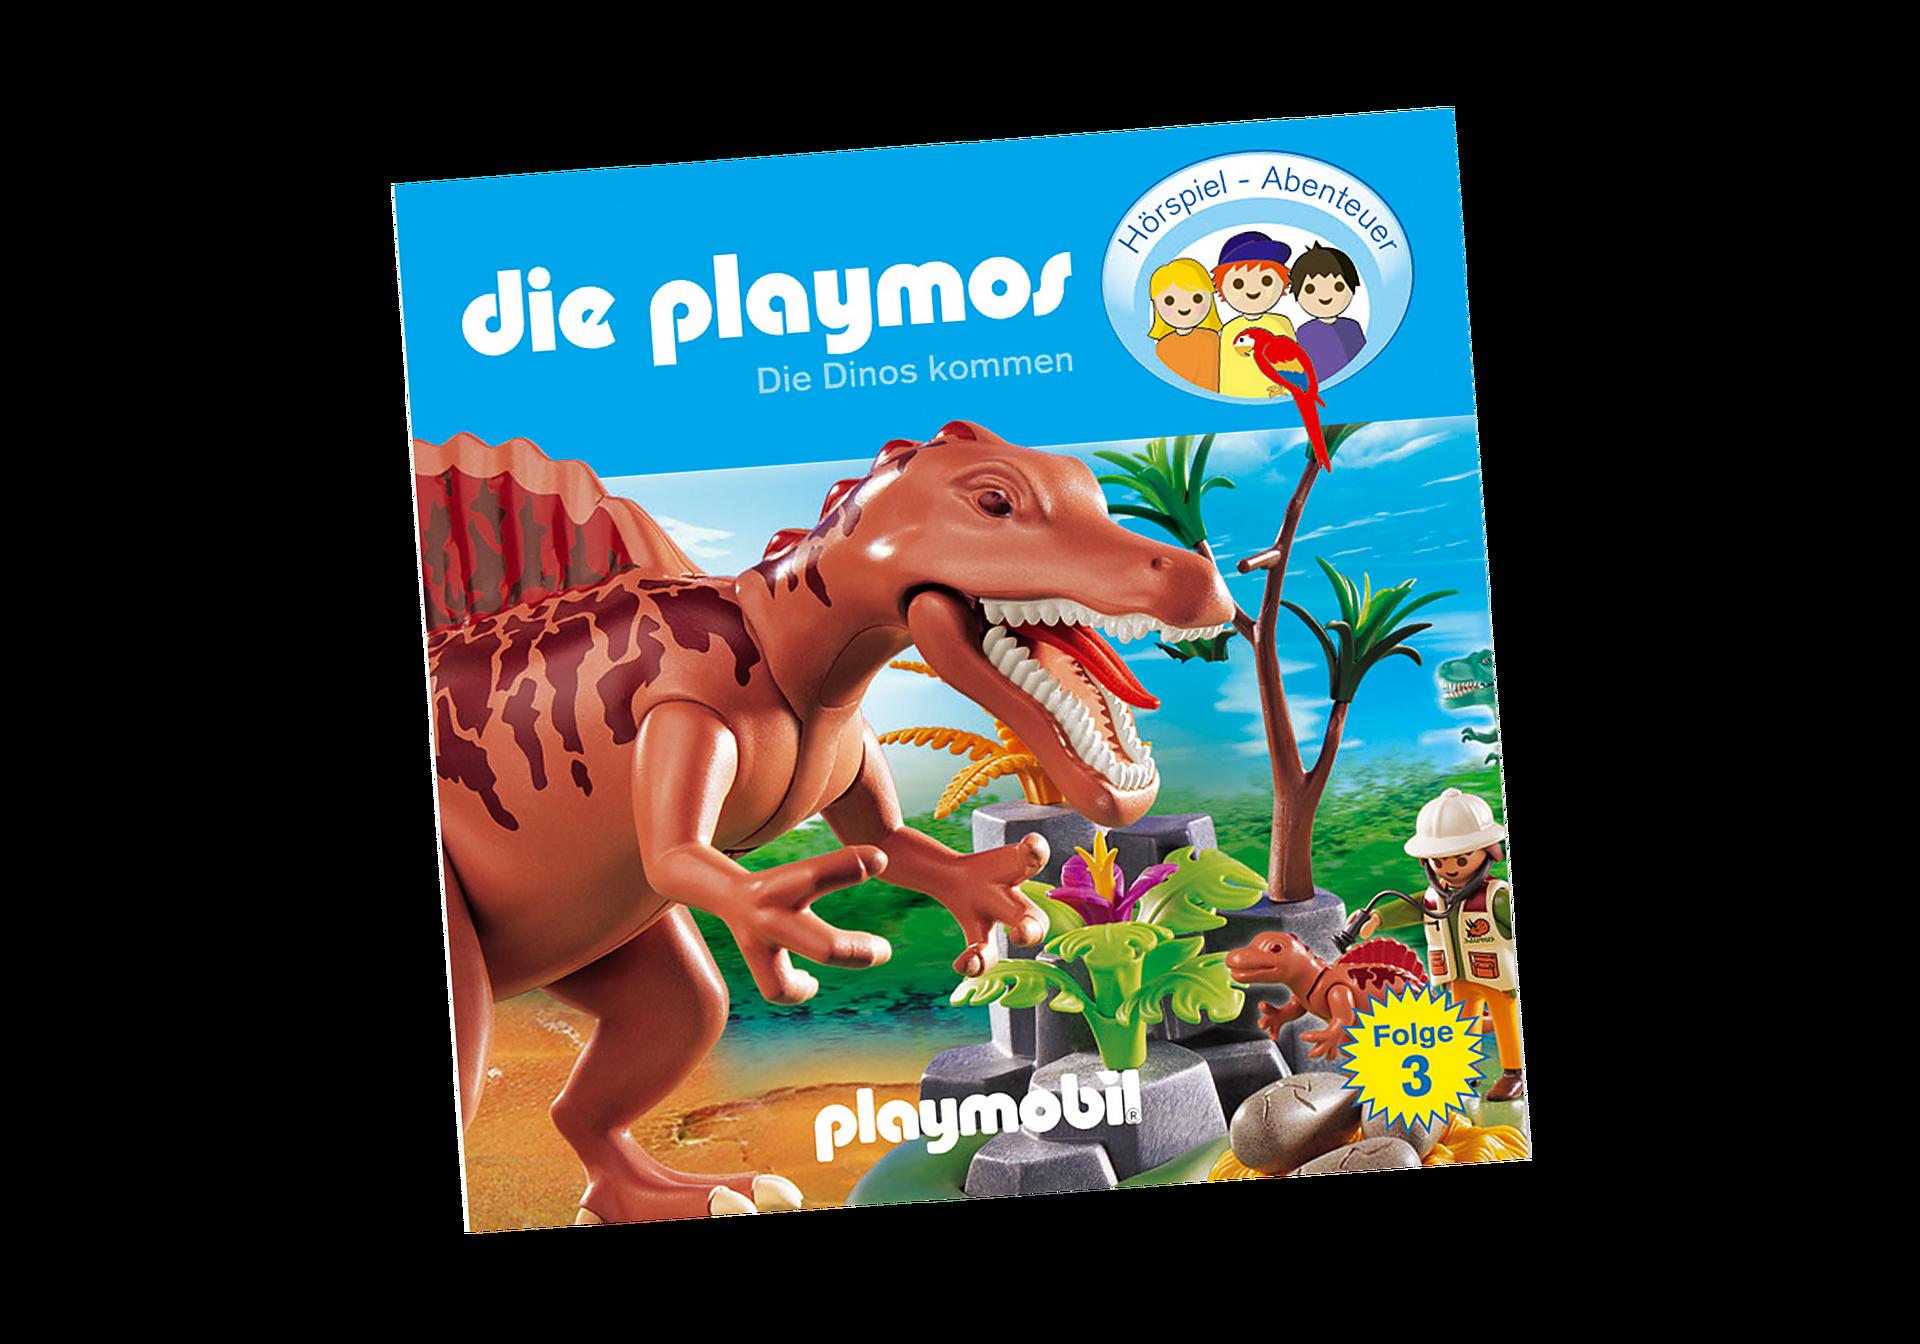 http://media.playmobil.com/i/playmobil/80132_product_detail/Die Dinos kommen (3) - CD